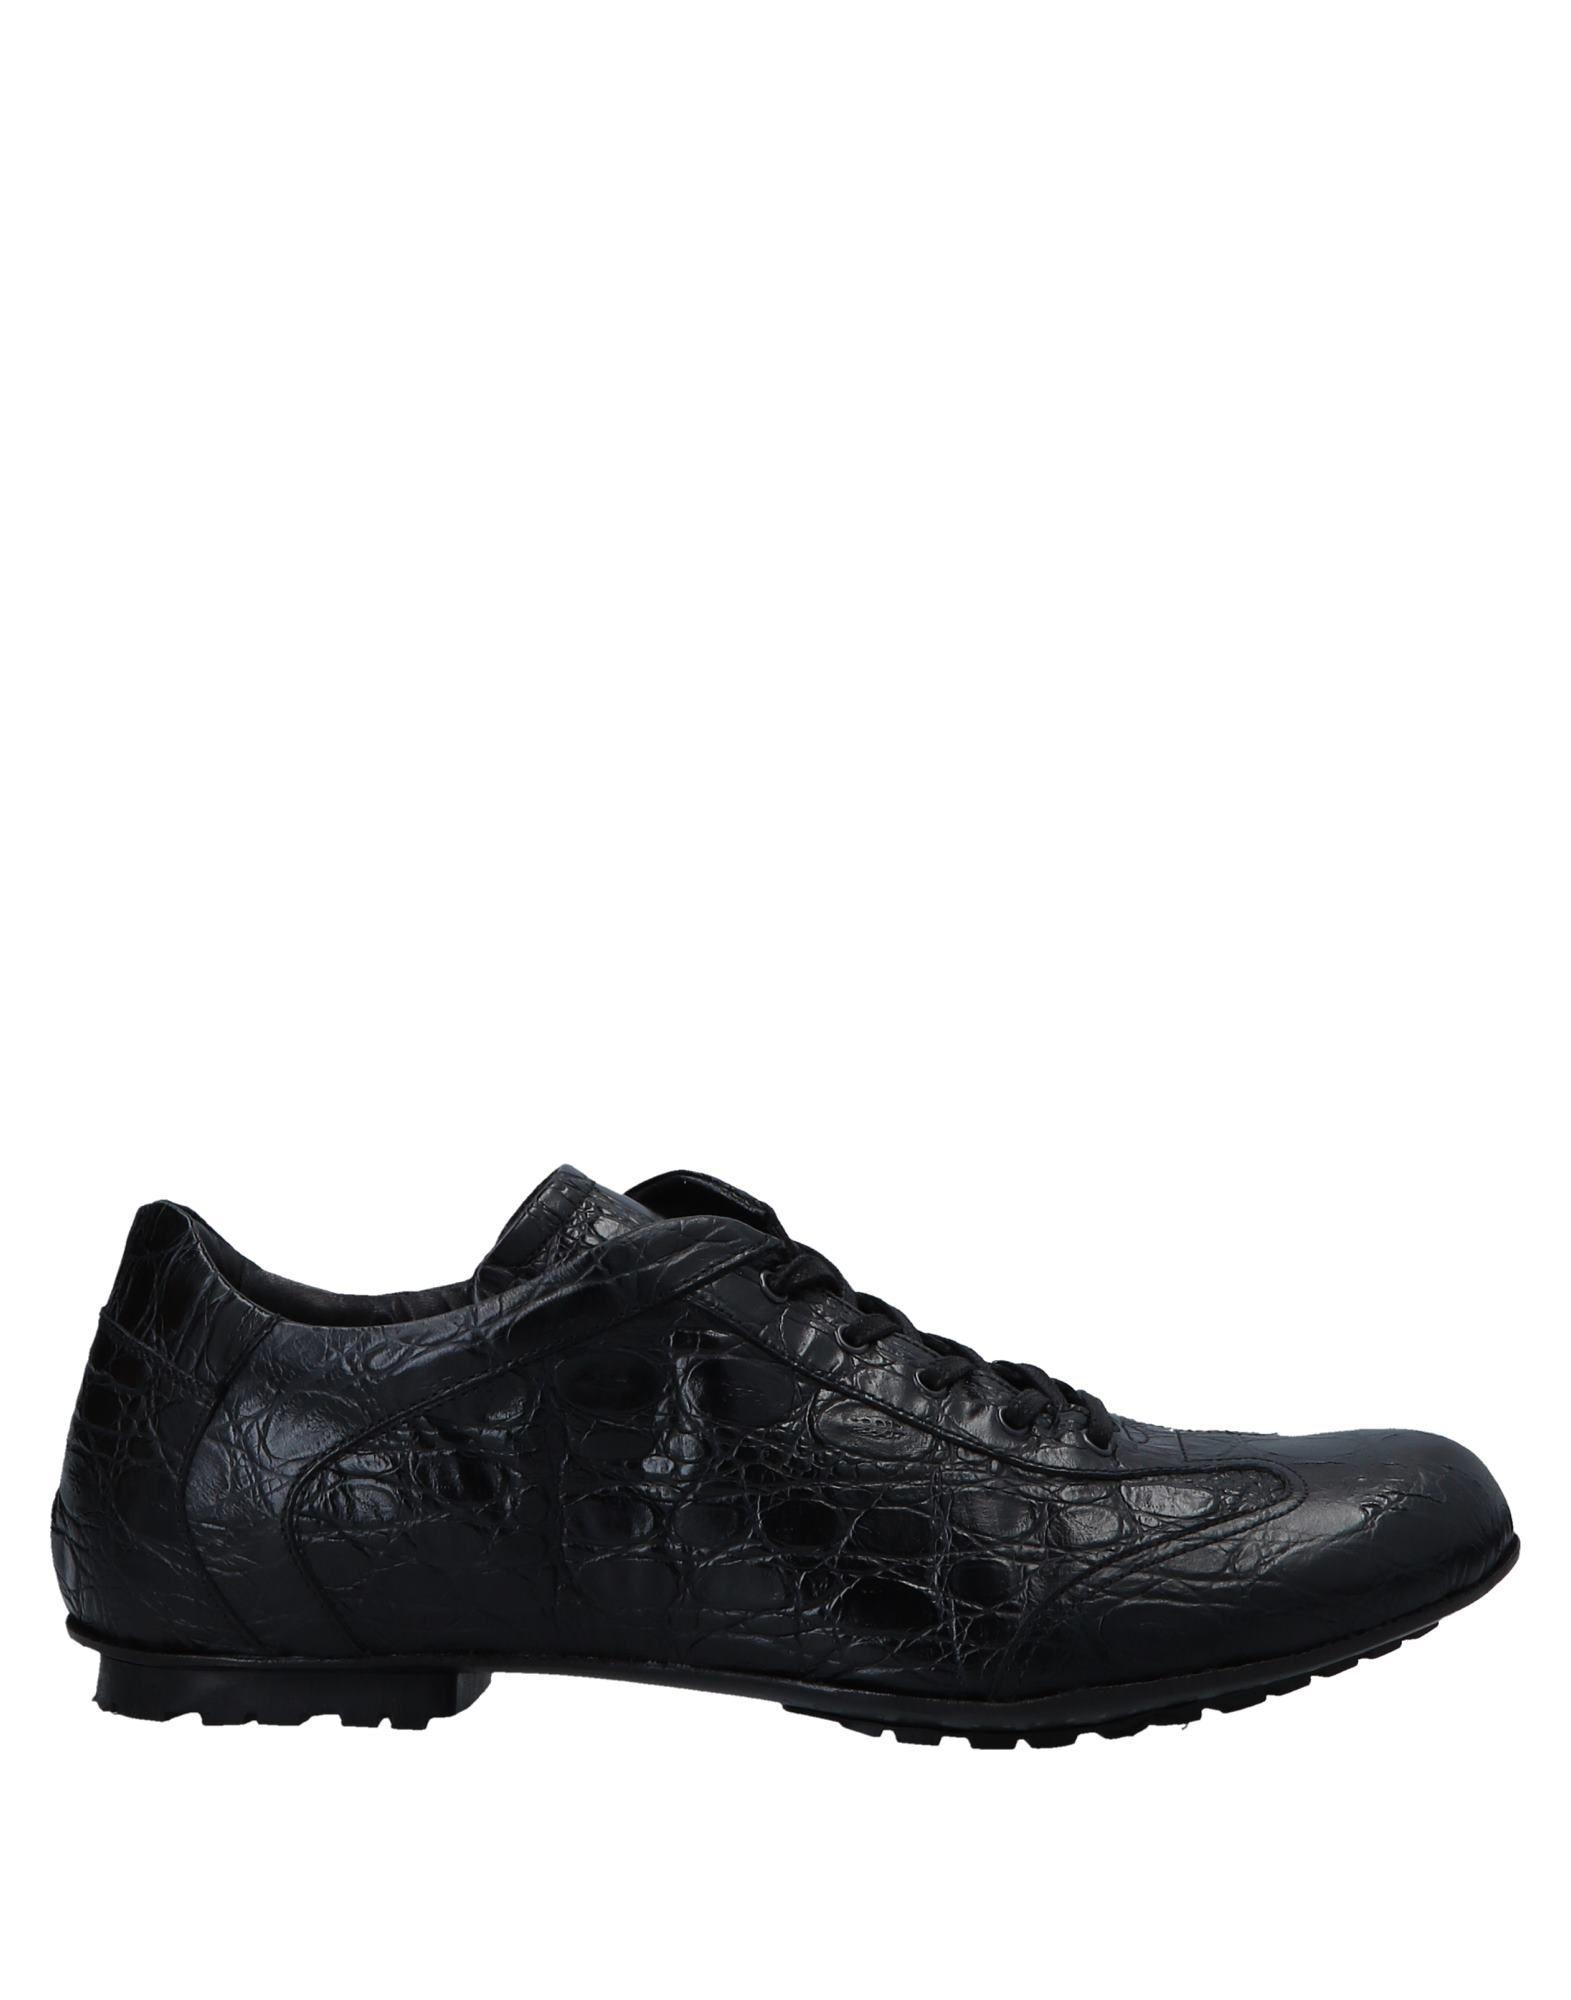 Baldinini Sneakers Herren  11554796VH Gute Qualität beliebte Schuhe